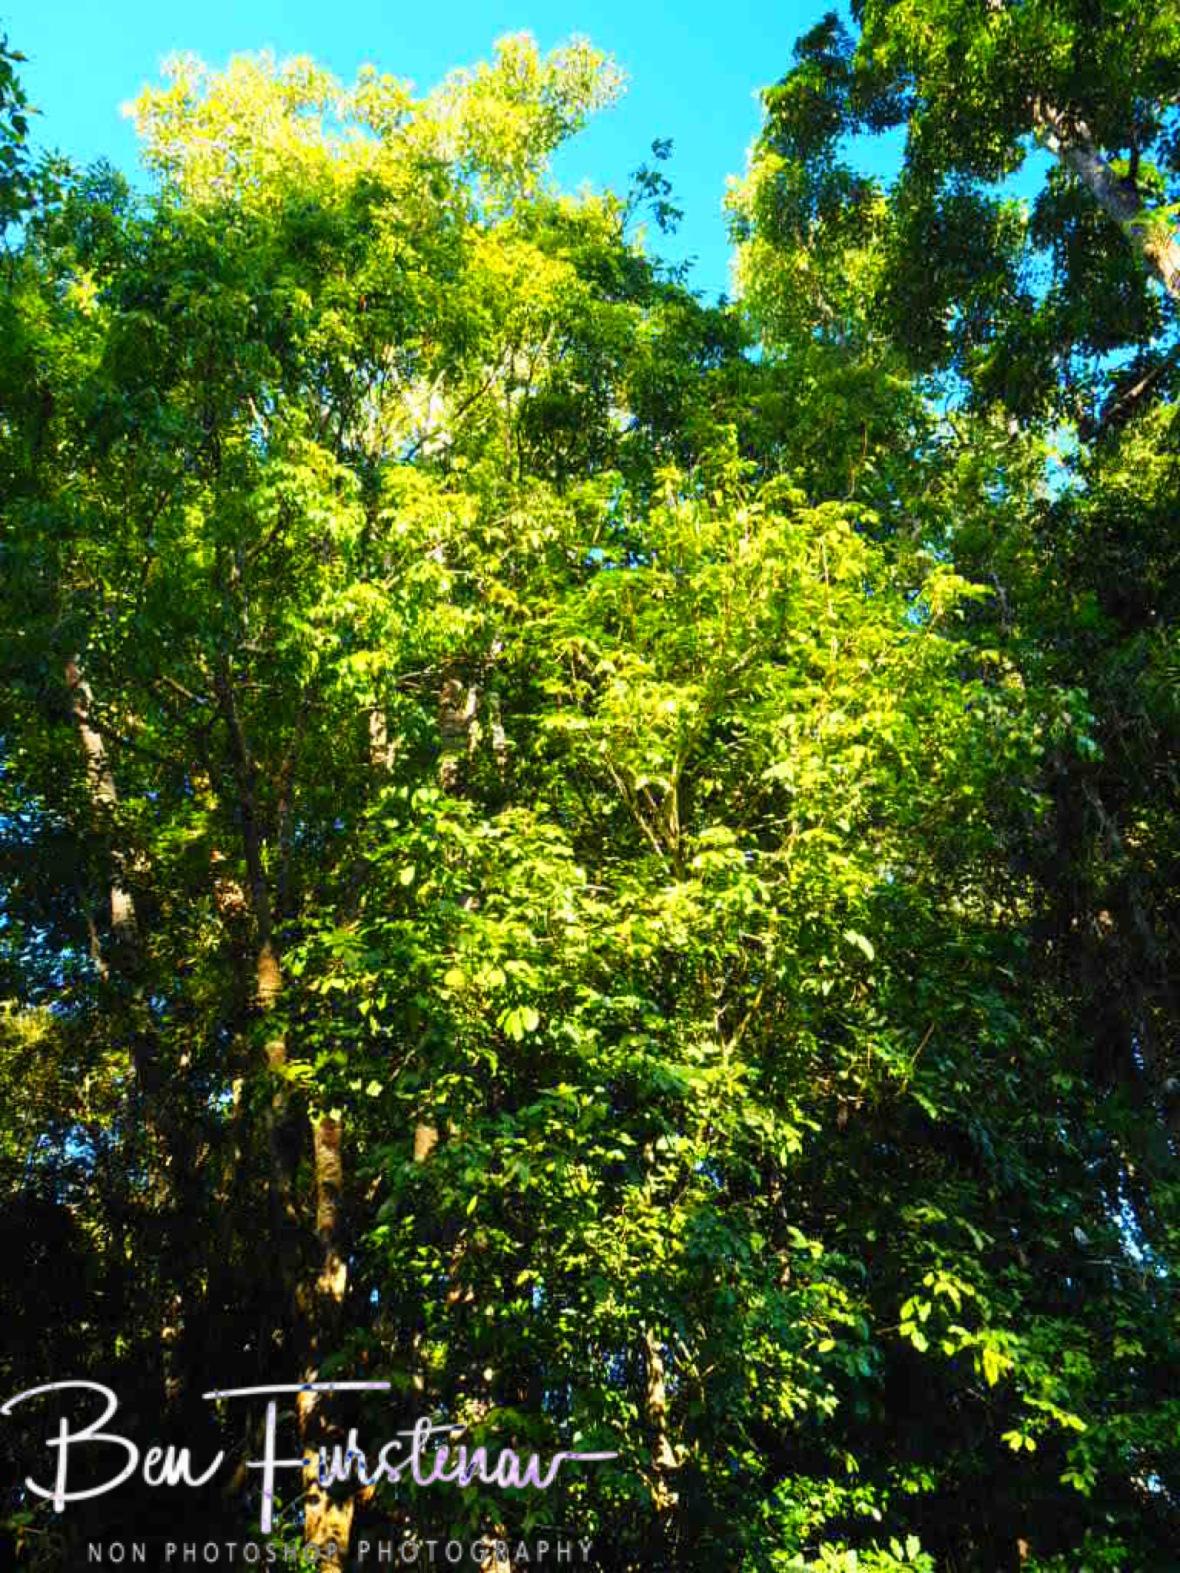 Less environmental impact, Atherton Tablelands, Far North Queensland, Australia